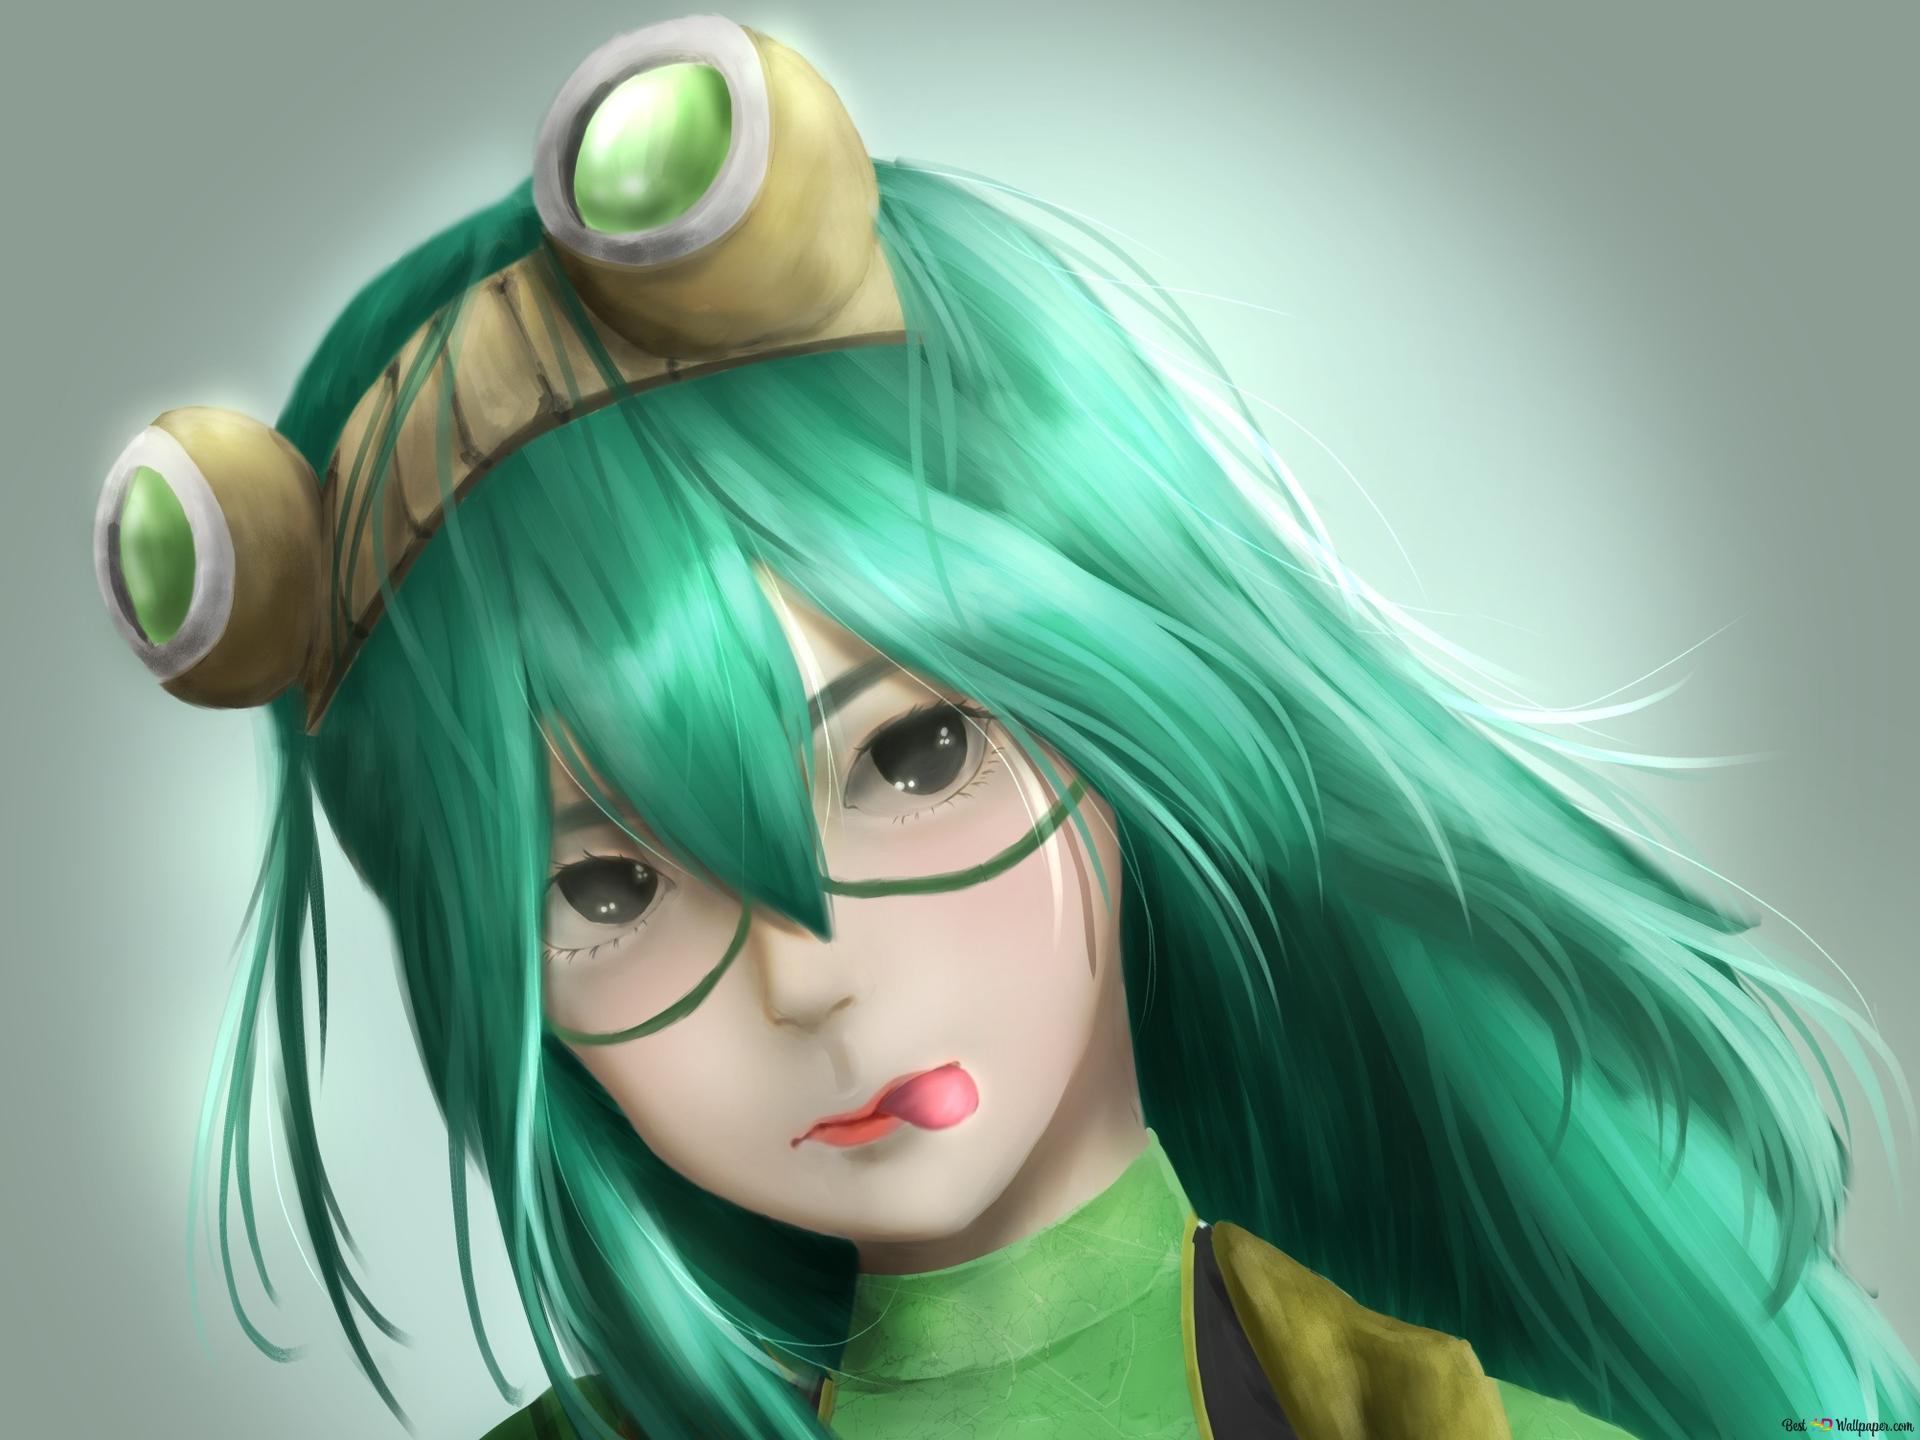 My Hero Academia Tsuyu Asui Rainy Hd Wallpaper Download